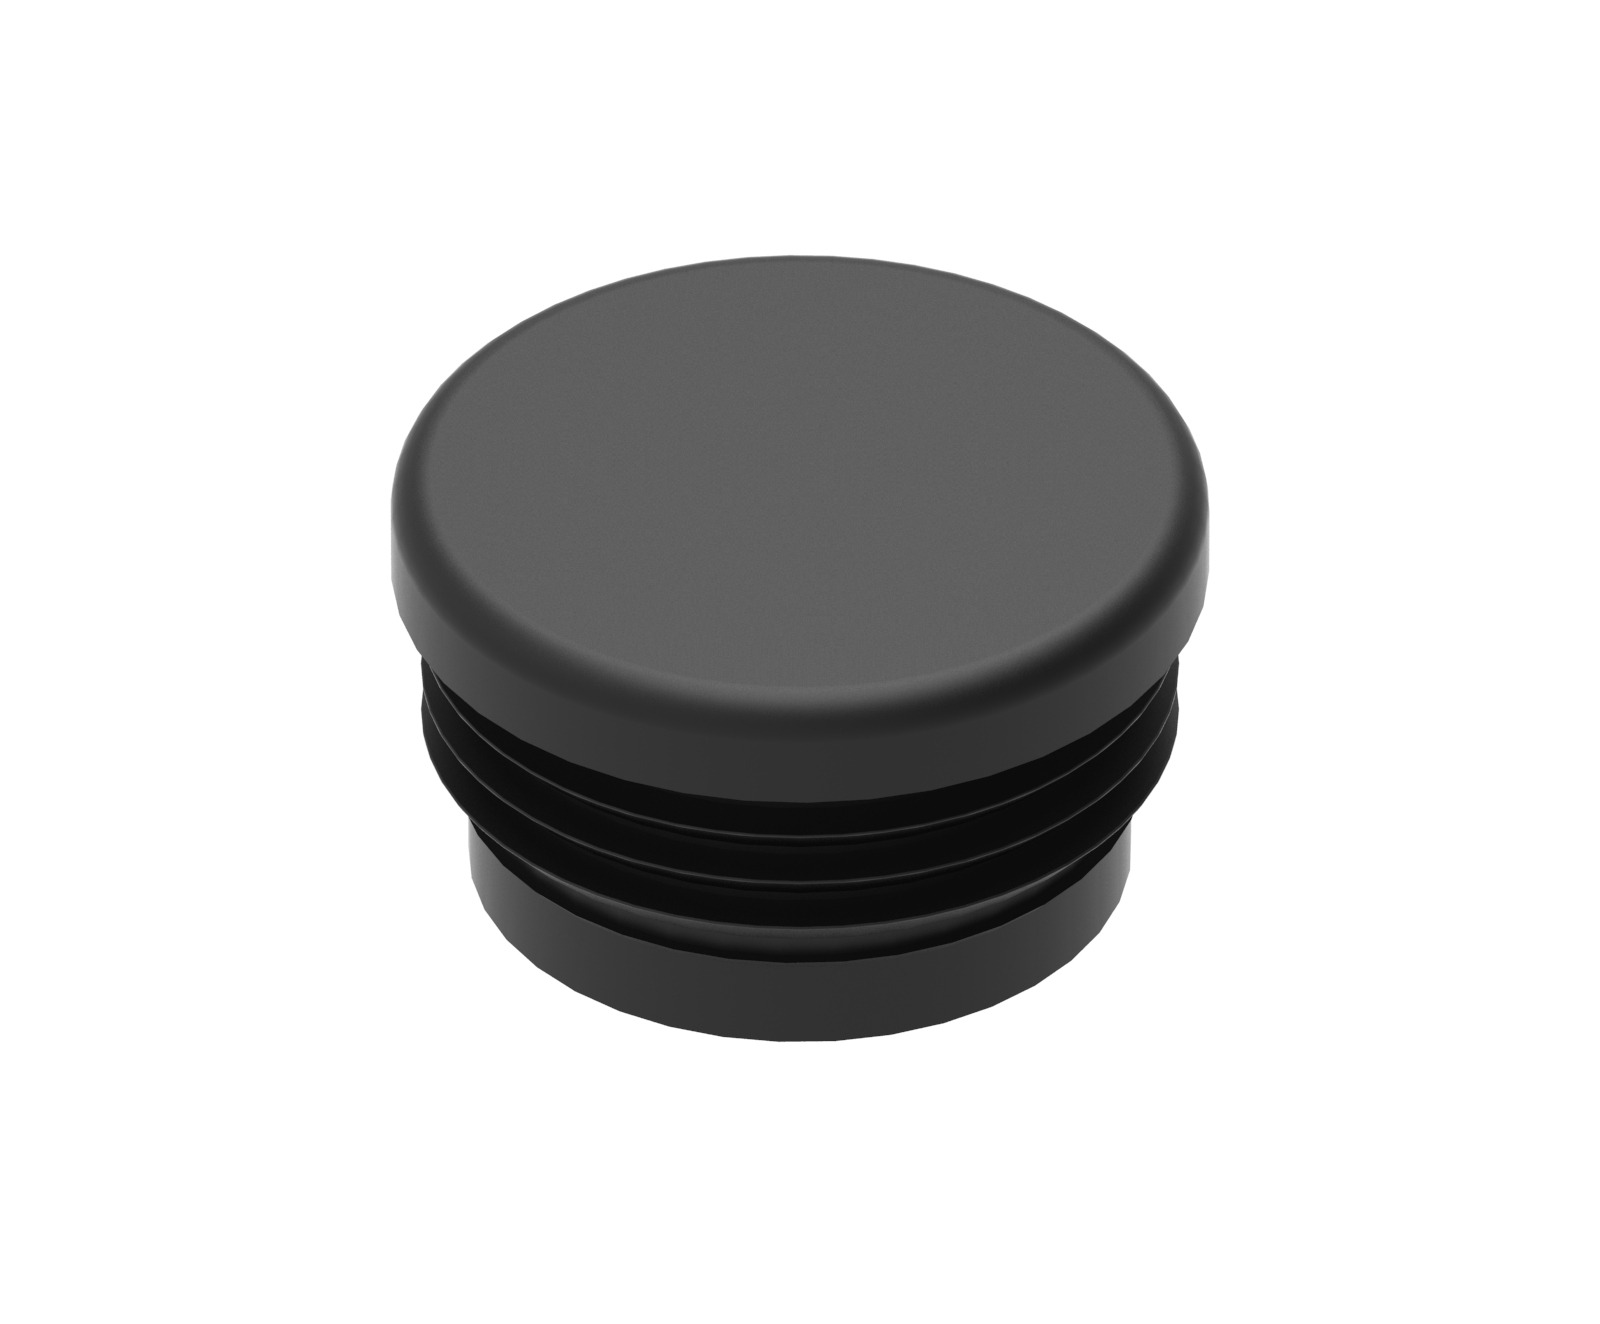 Round cap Ø40